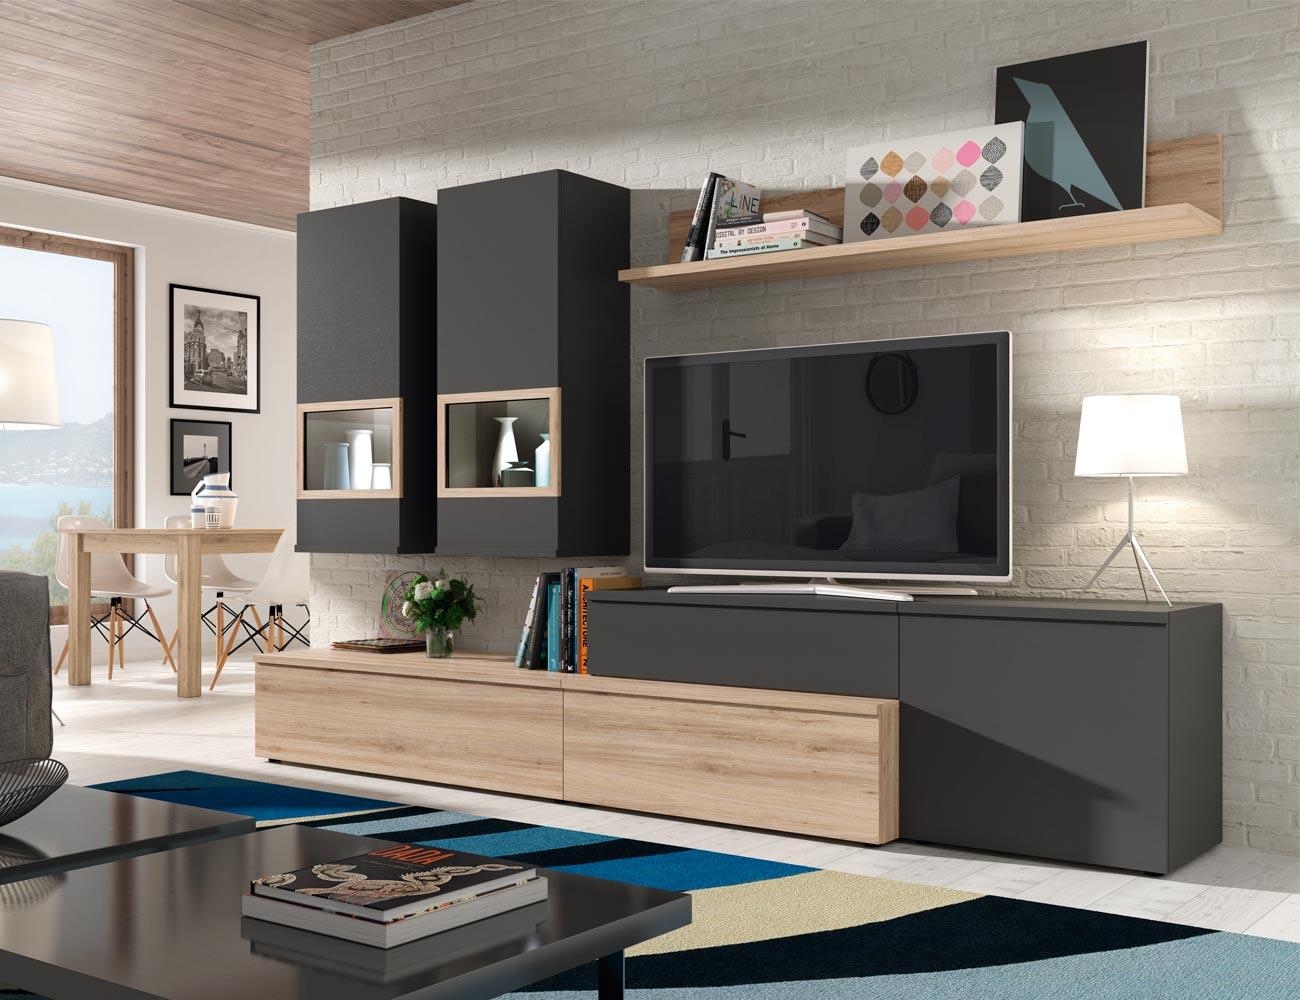 610 mueble salon comedor roble natural antracita focos leds